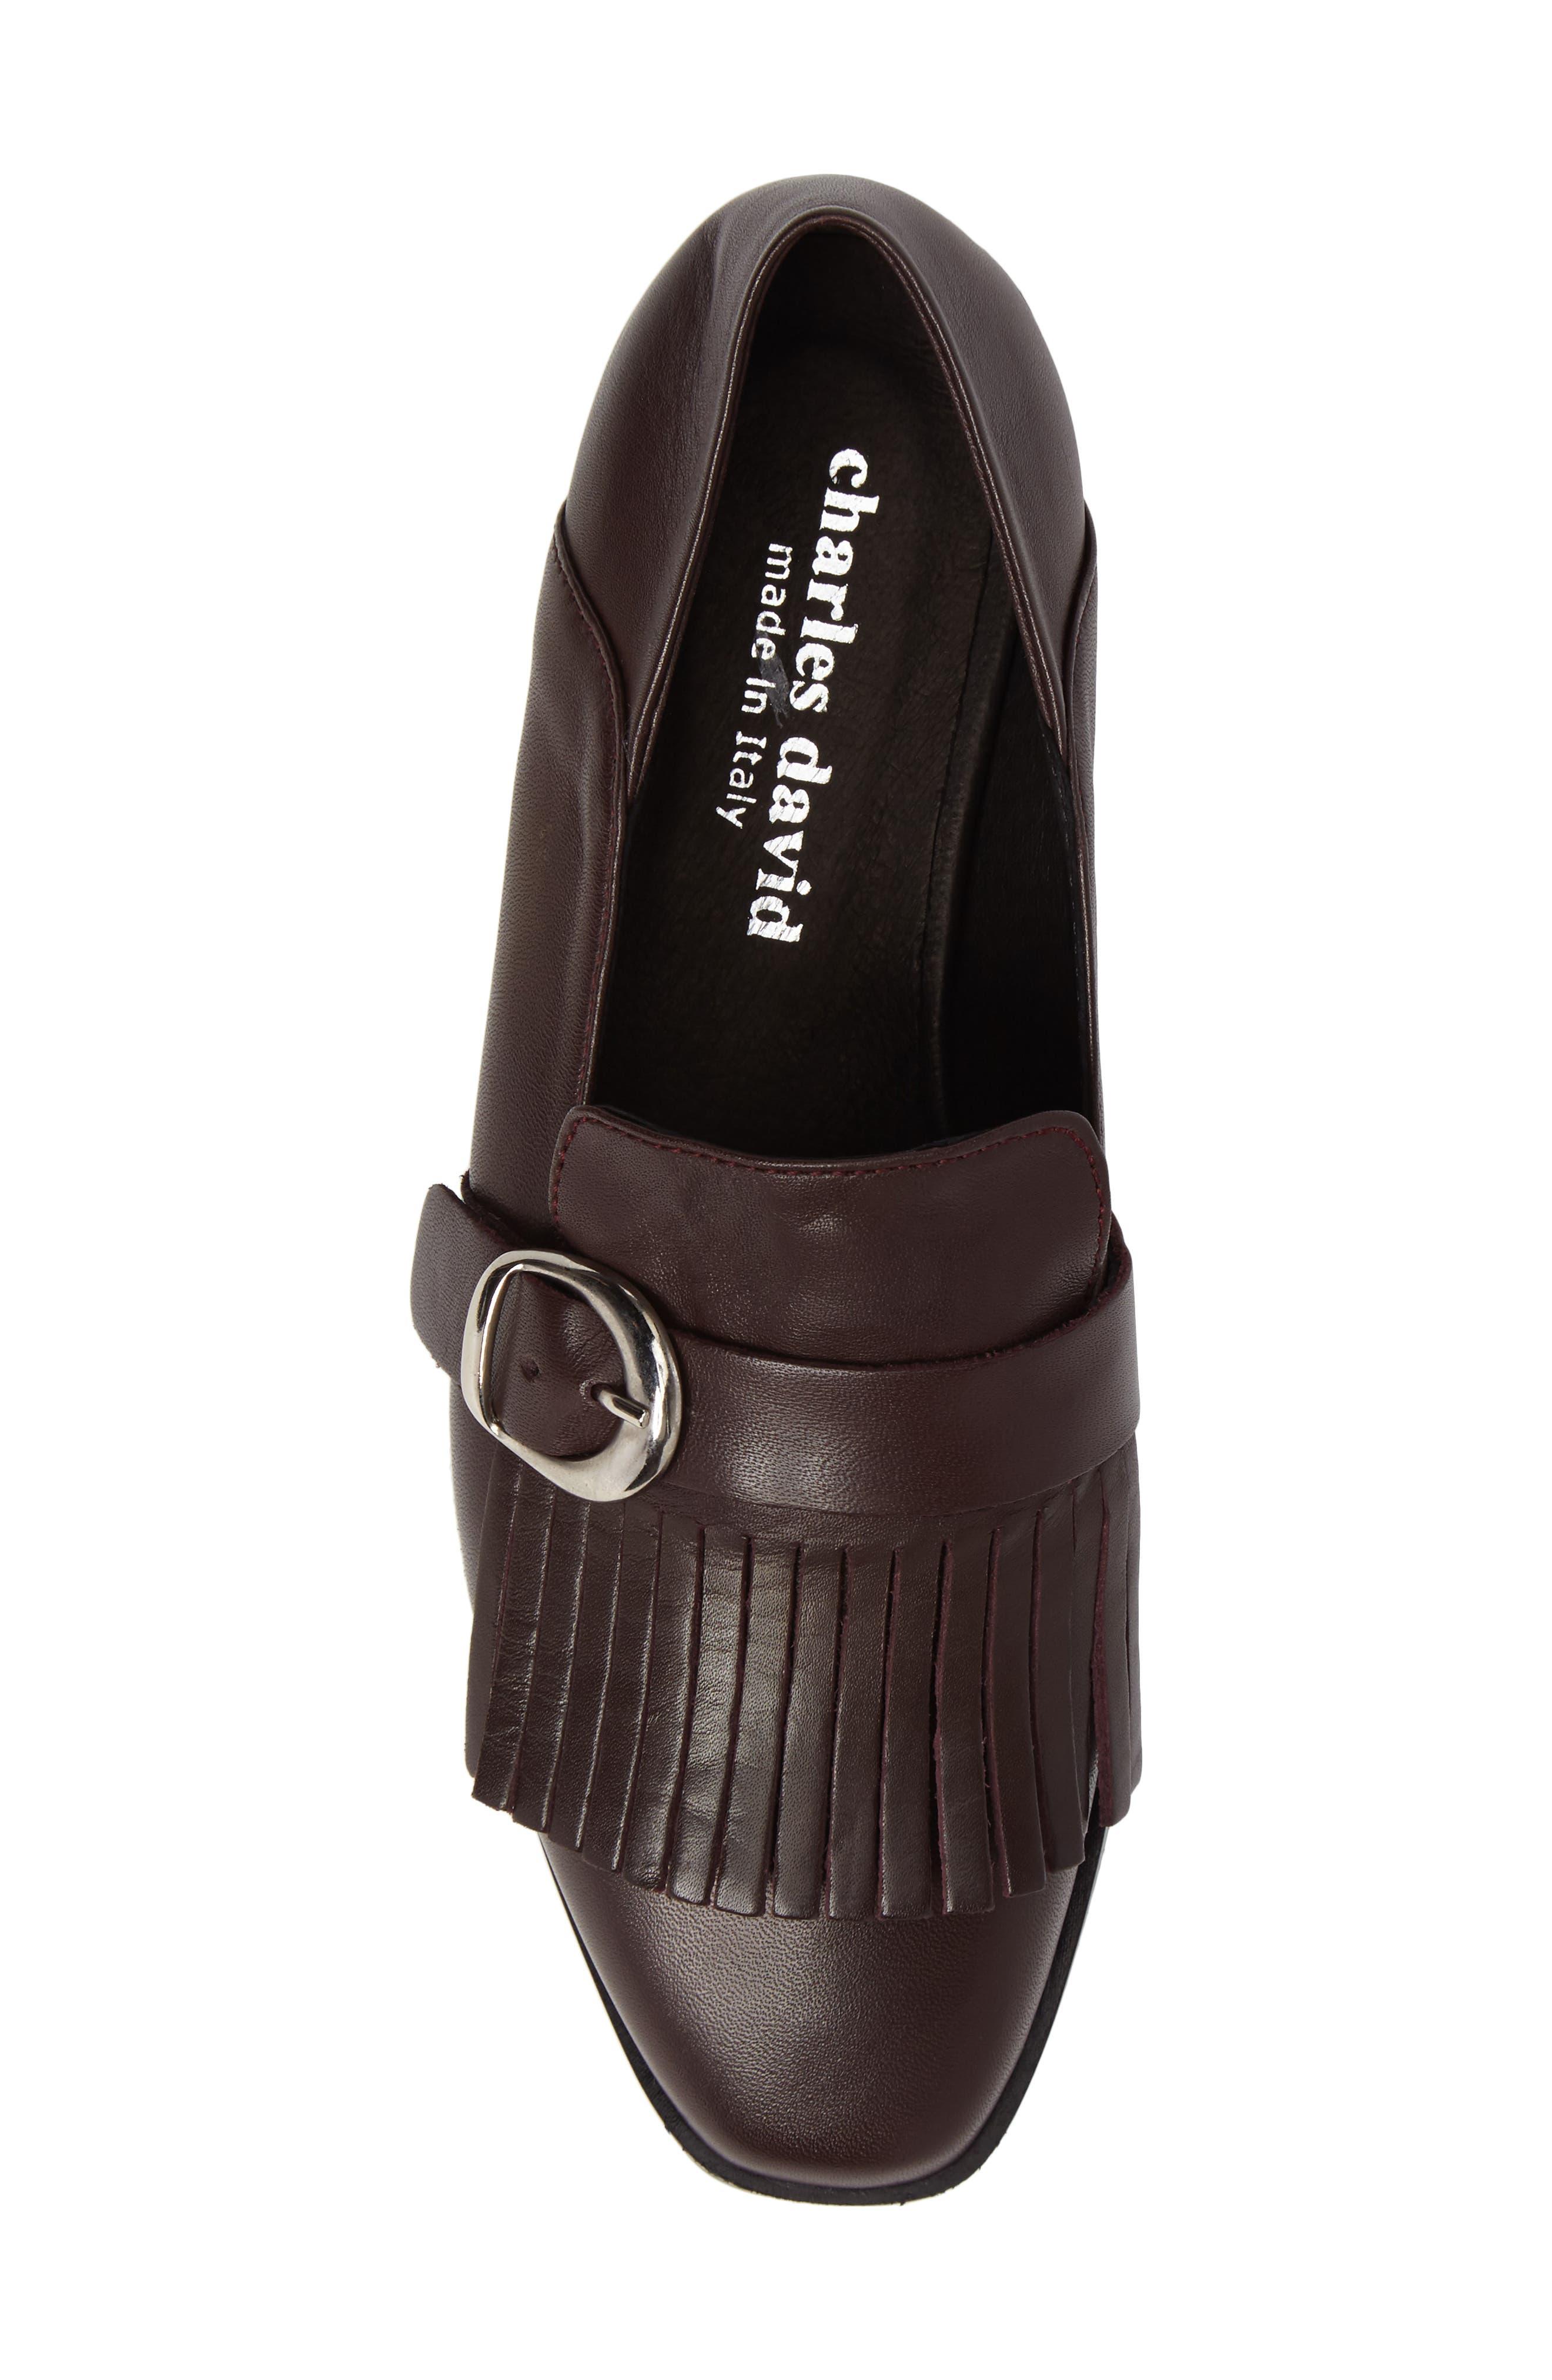 Dame Fringed Loafer Flat,                             Alternate thumbnail 5, color,                             Burgundy Leather